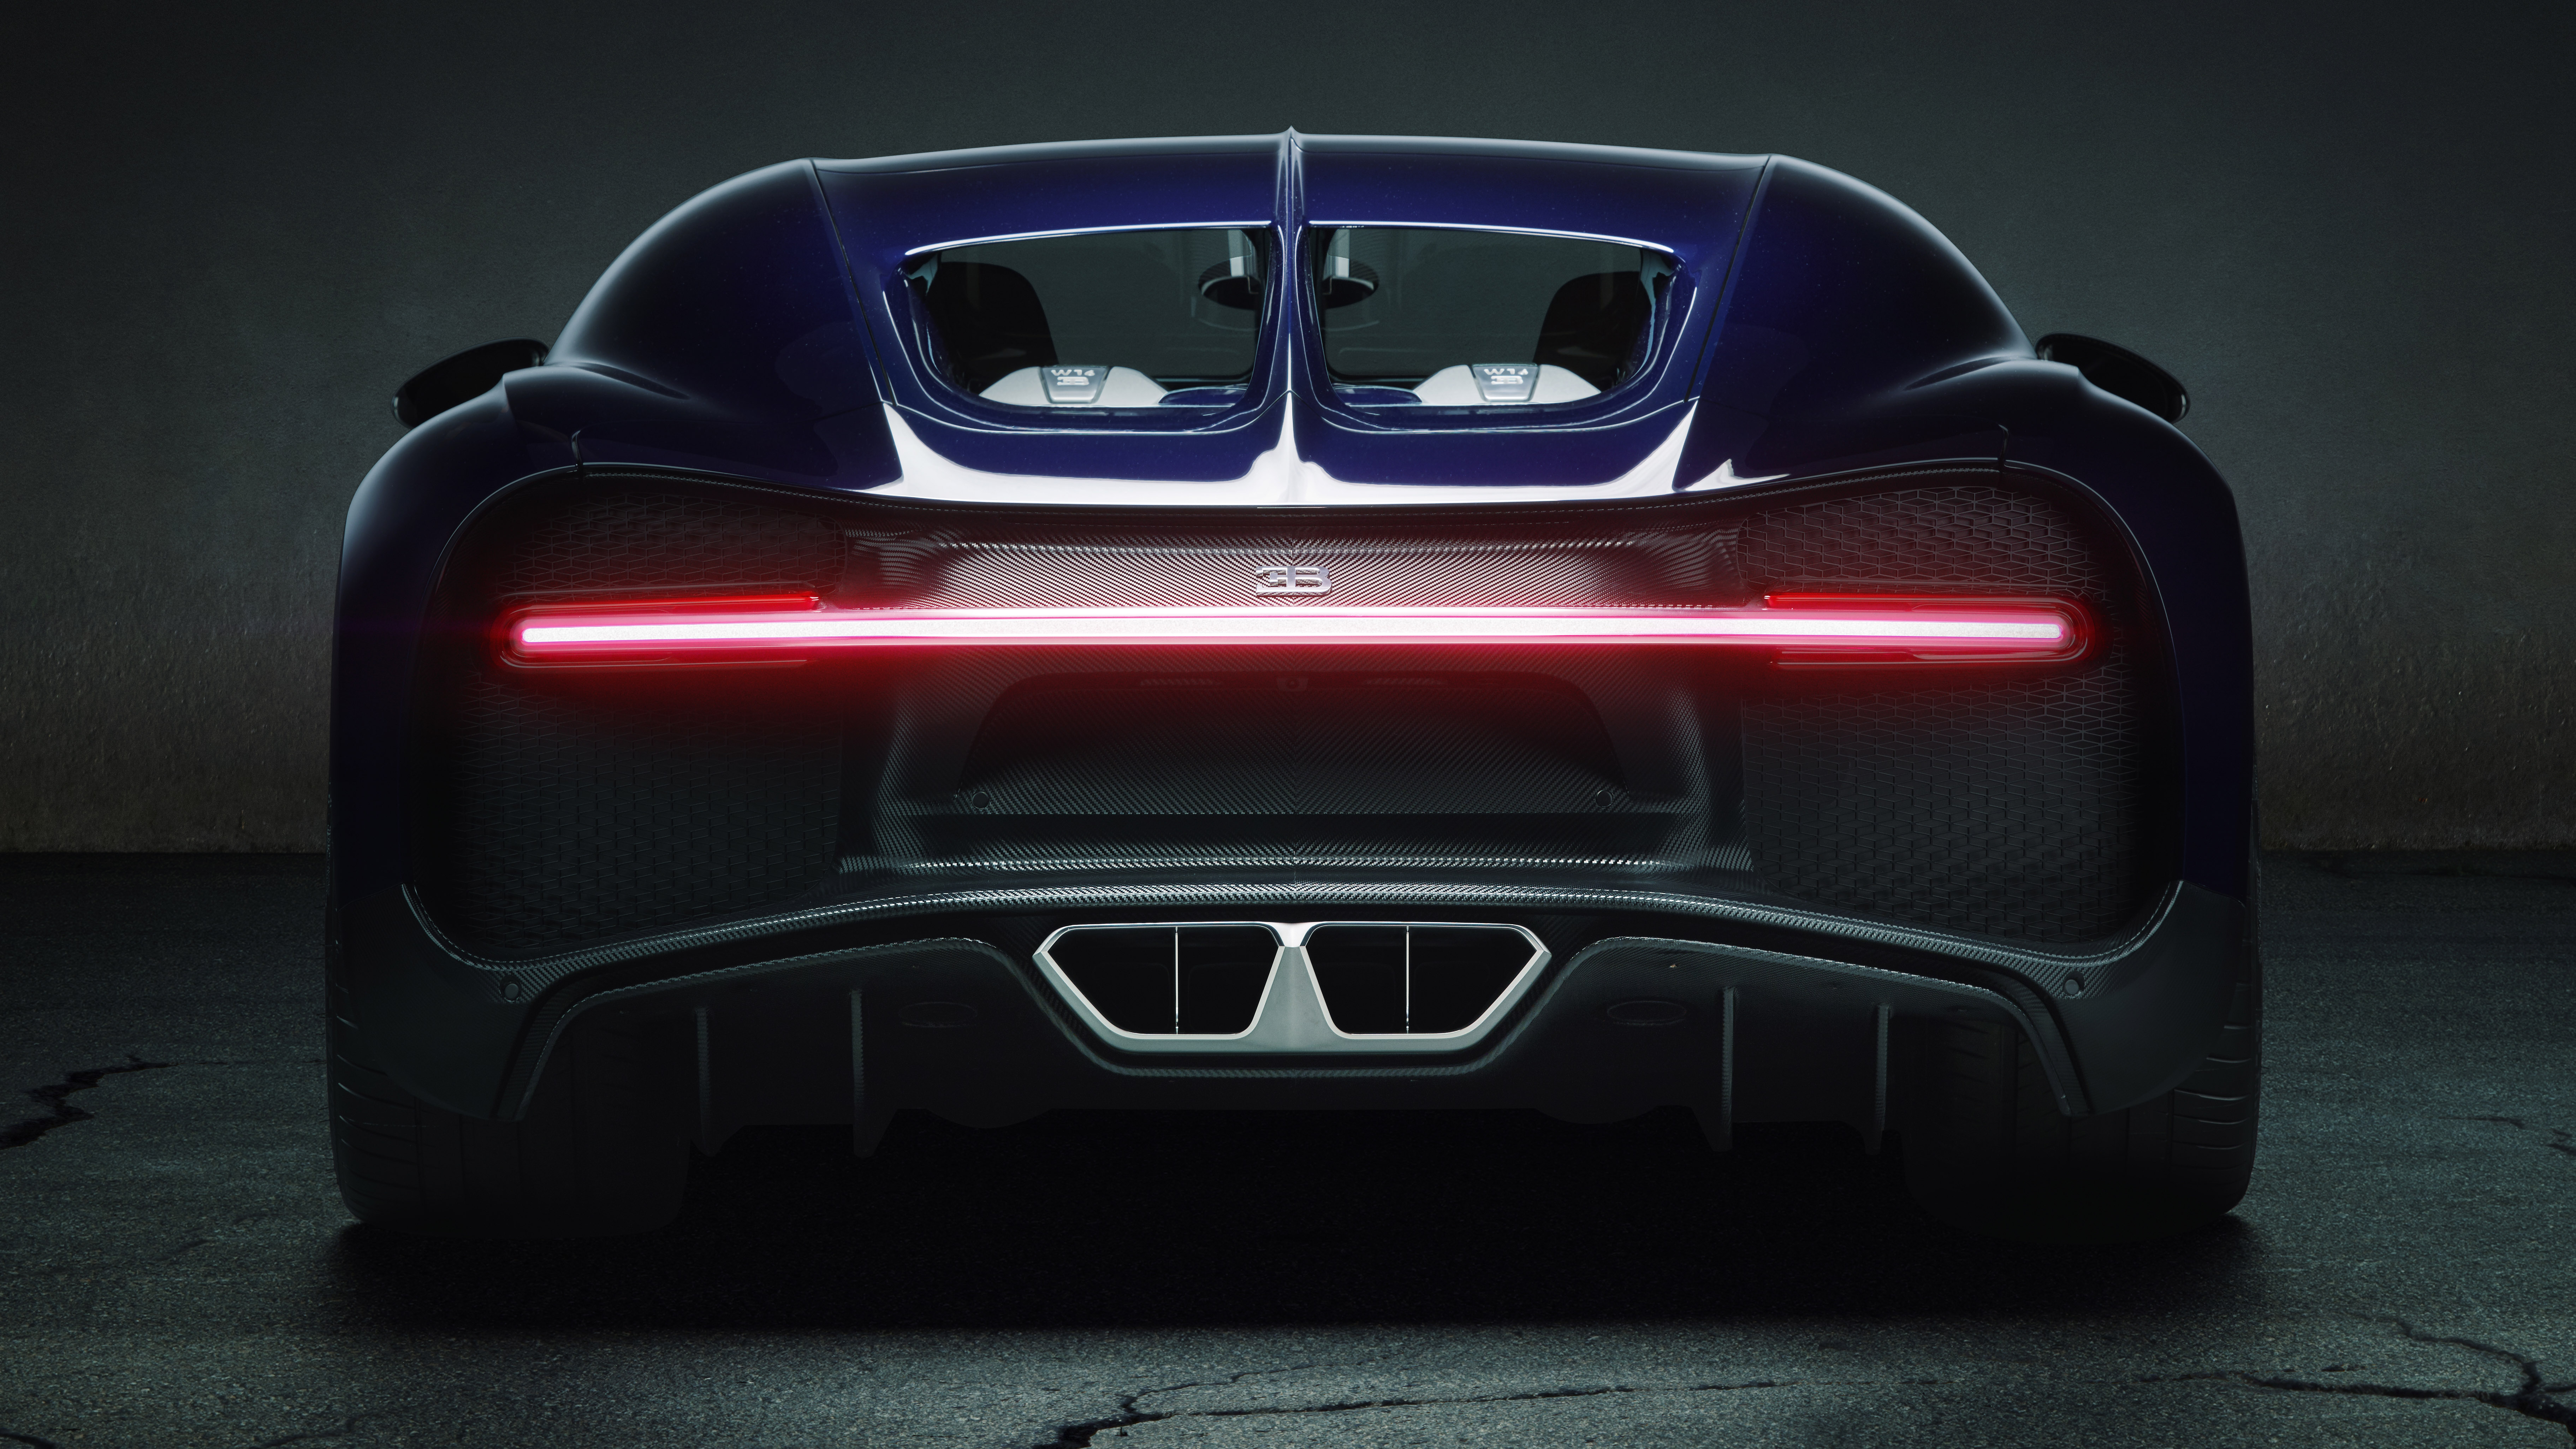 Mazda Furai Vehículos Supercars Hd Fondos De Pantalla: All Hail The New Bugatti Chiron